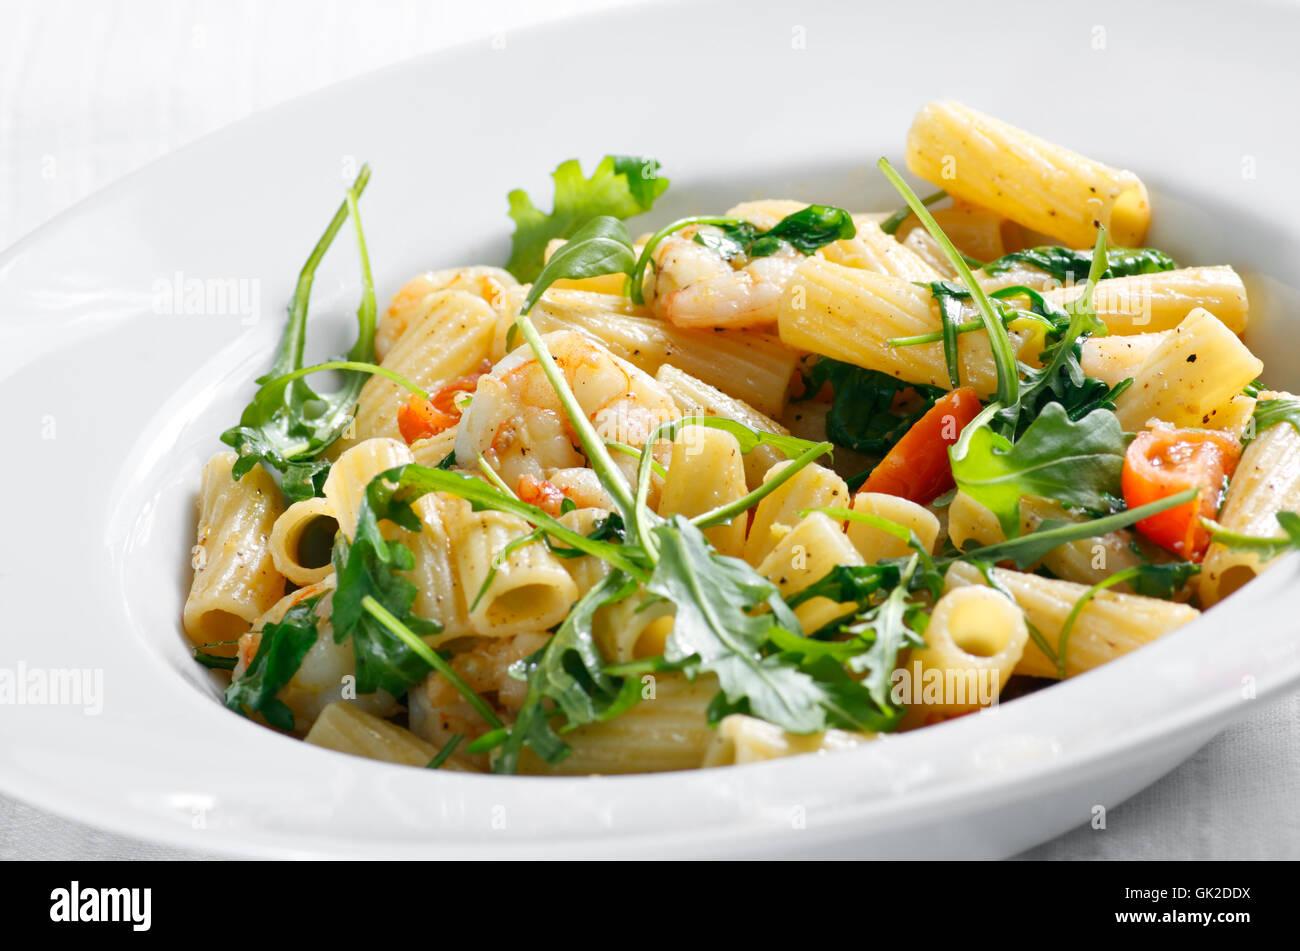 pasta with shrimp - Stock Image